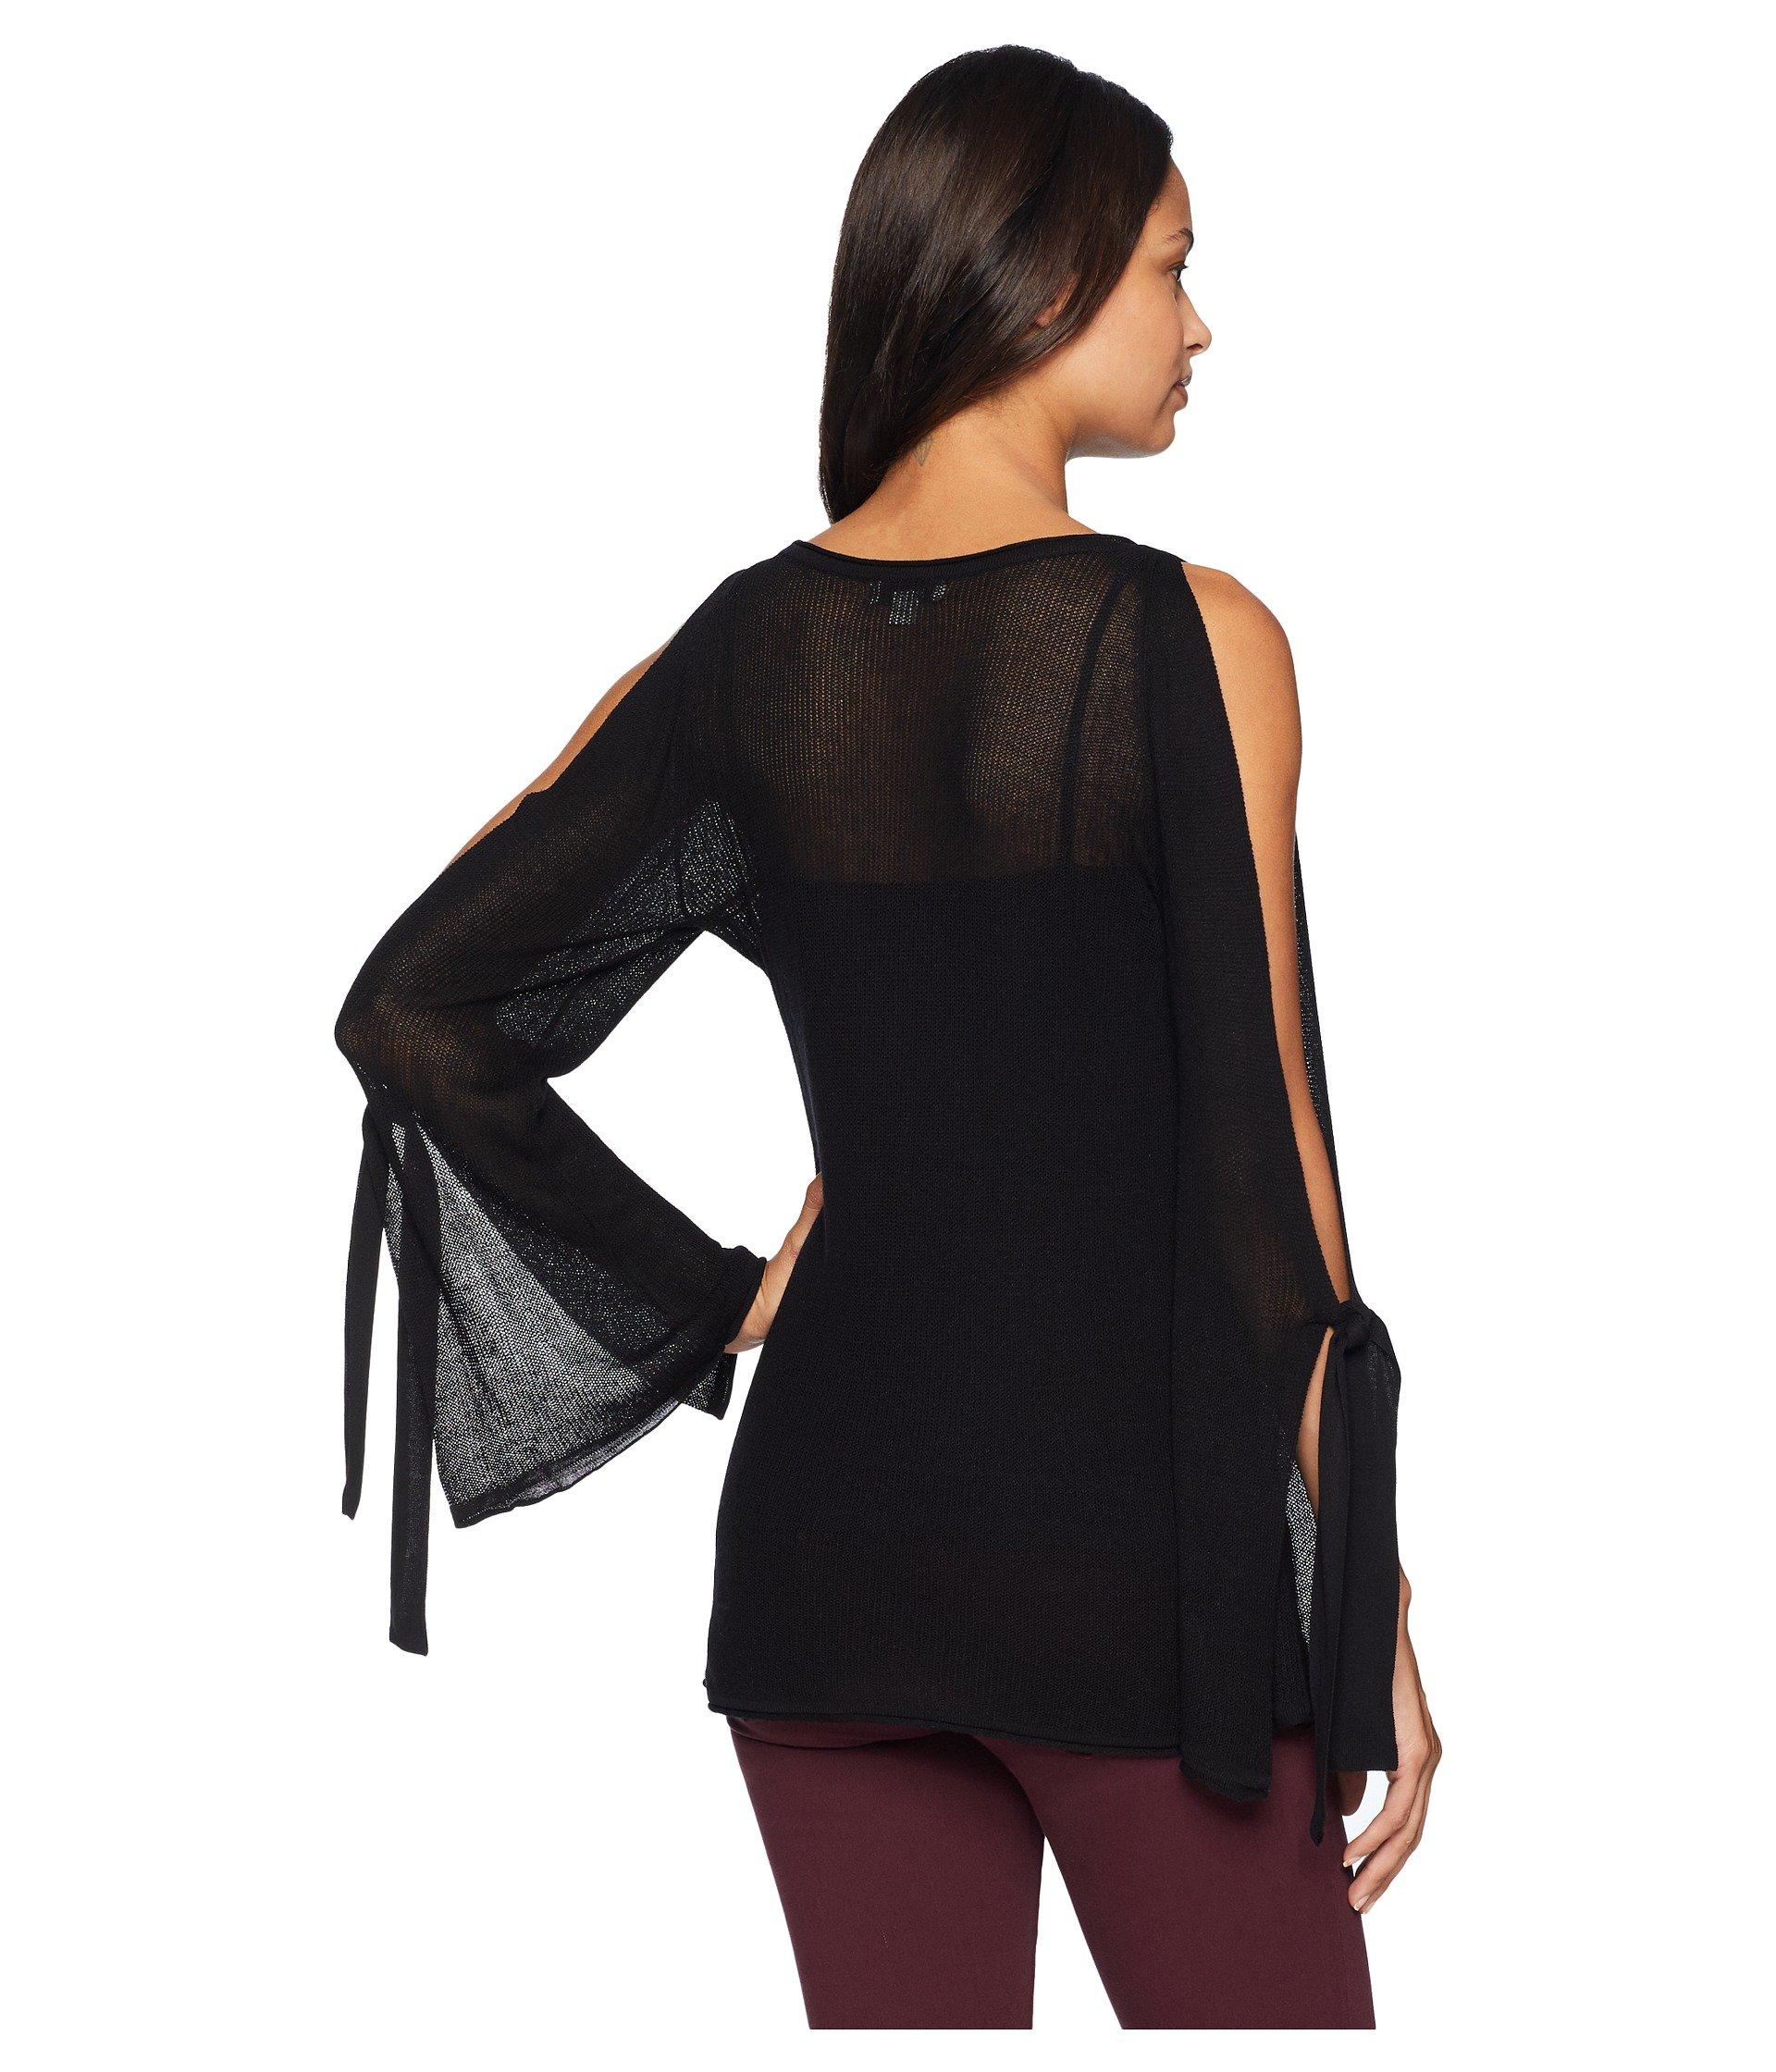 Sweater Black Ks8k5635 Viscose Kensie Textured wqx8AvaZg